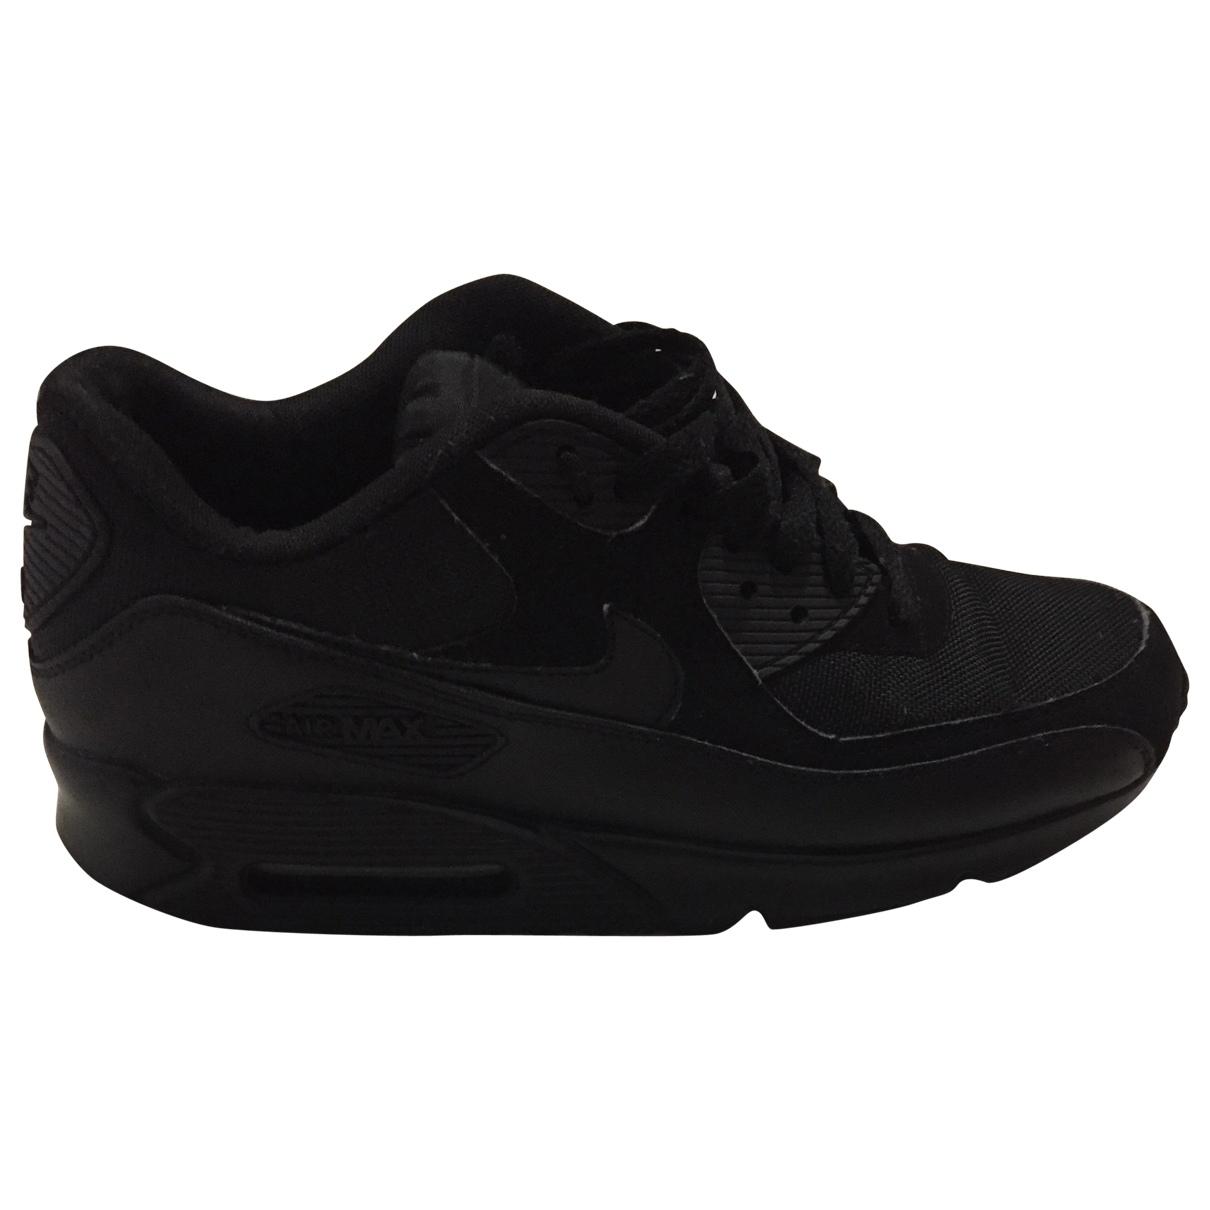 Nike Air Max 90 Sneakers in  Schwarz Leinen